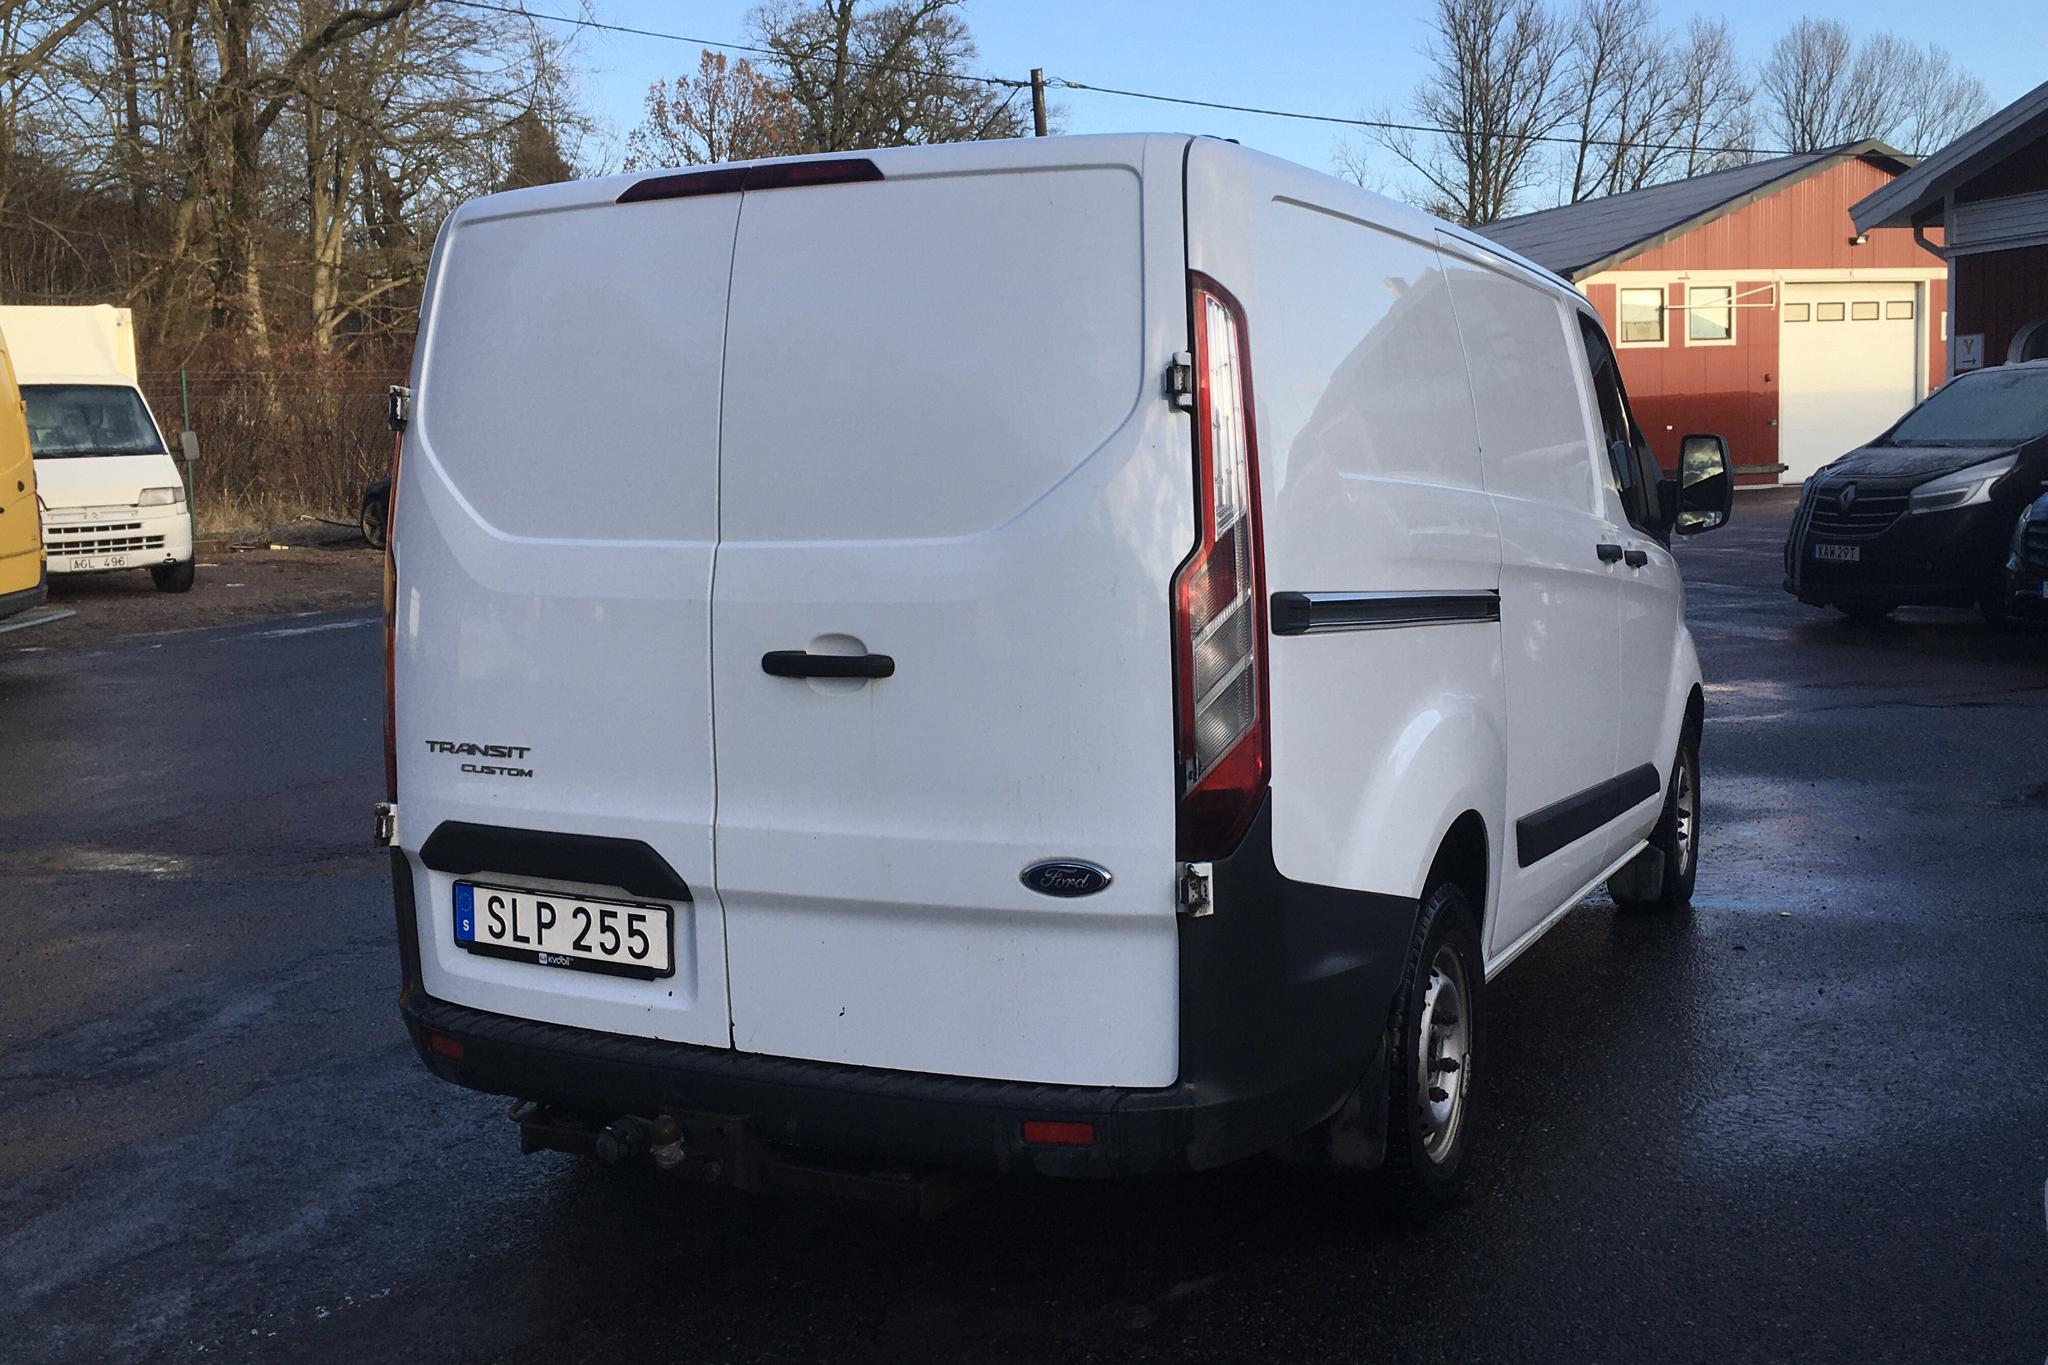 Ford Transit Custom 270 (105hk) - 150 010 km - Manual - white - 2017